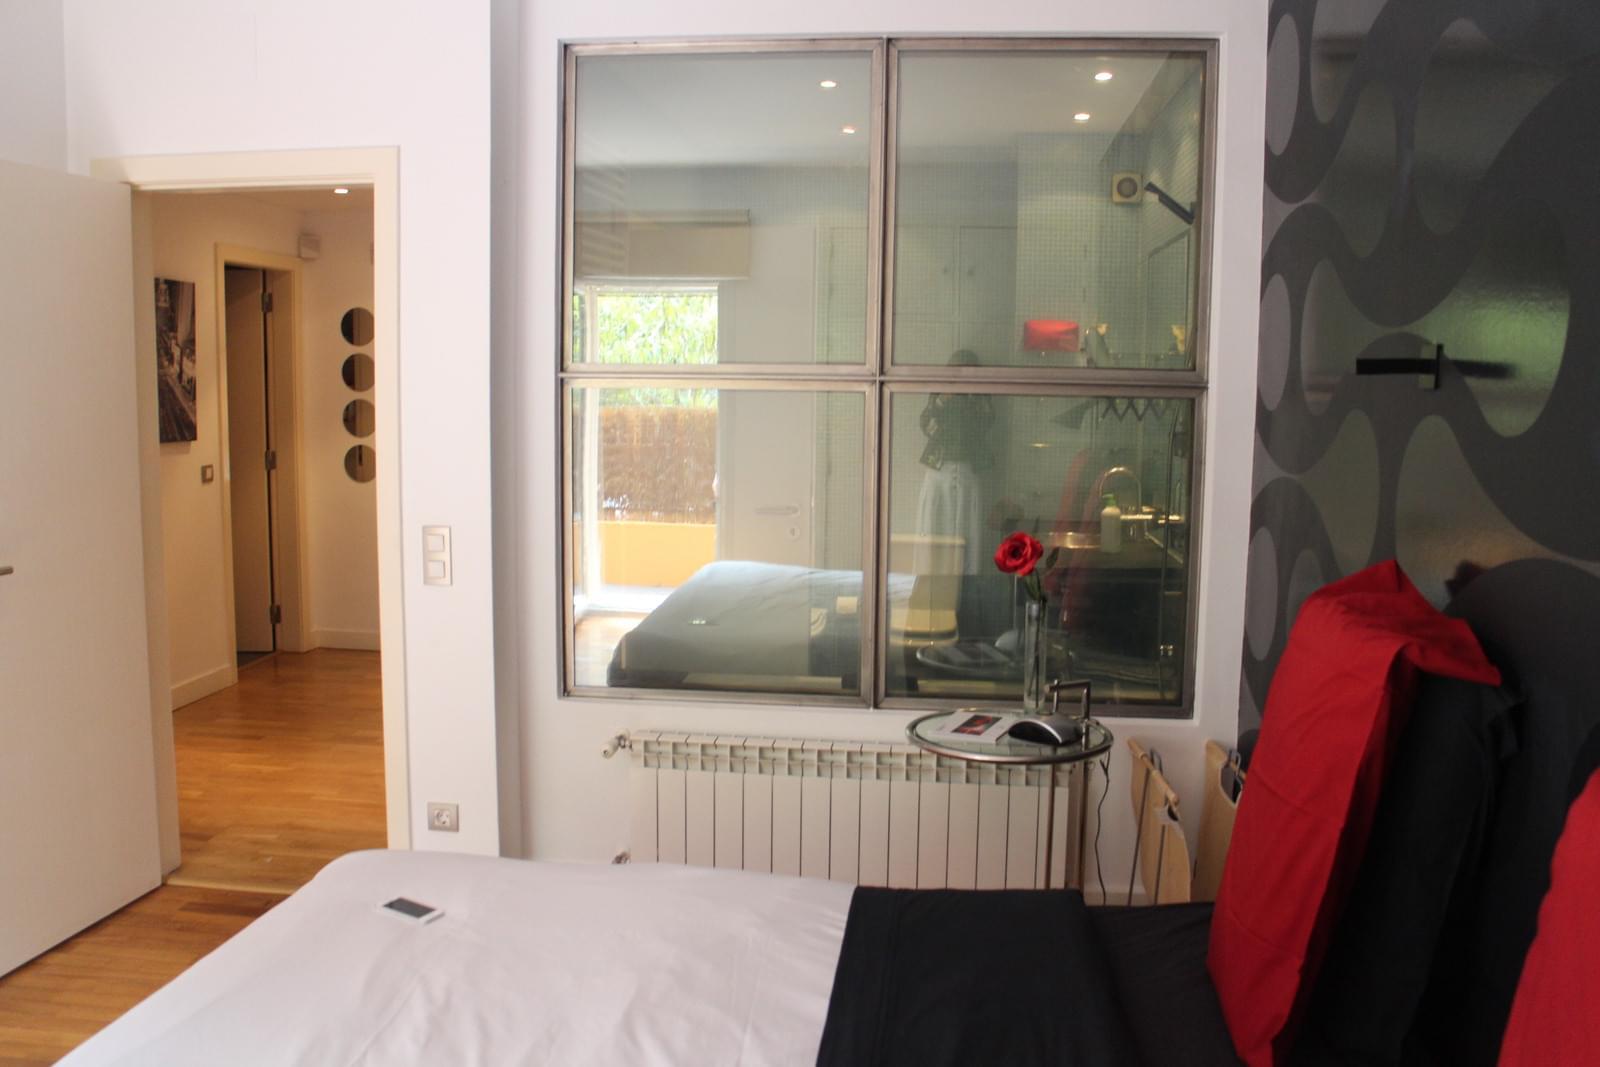 pf17538-apartamento-t2-cascais-ff1ab461-a1ec-4808-88de-a2a0b0d8eba5